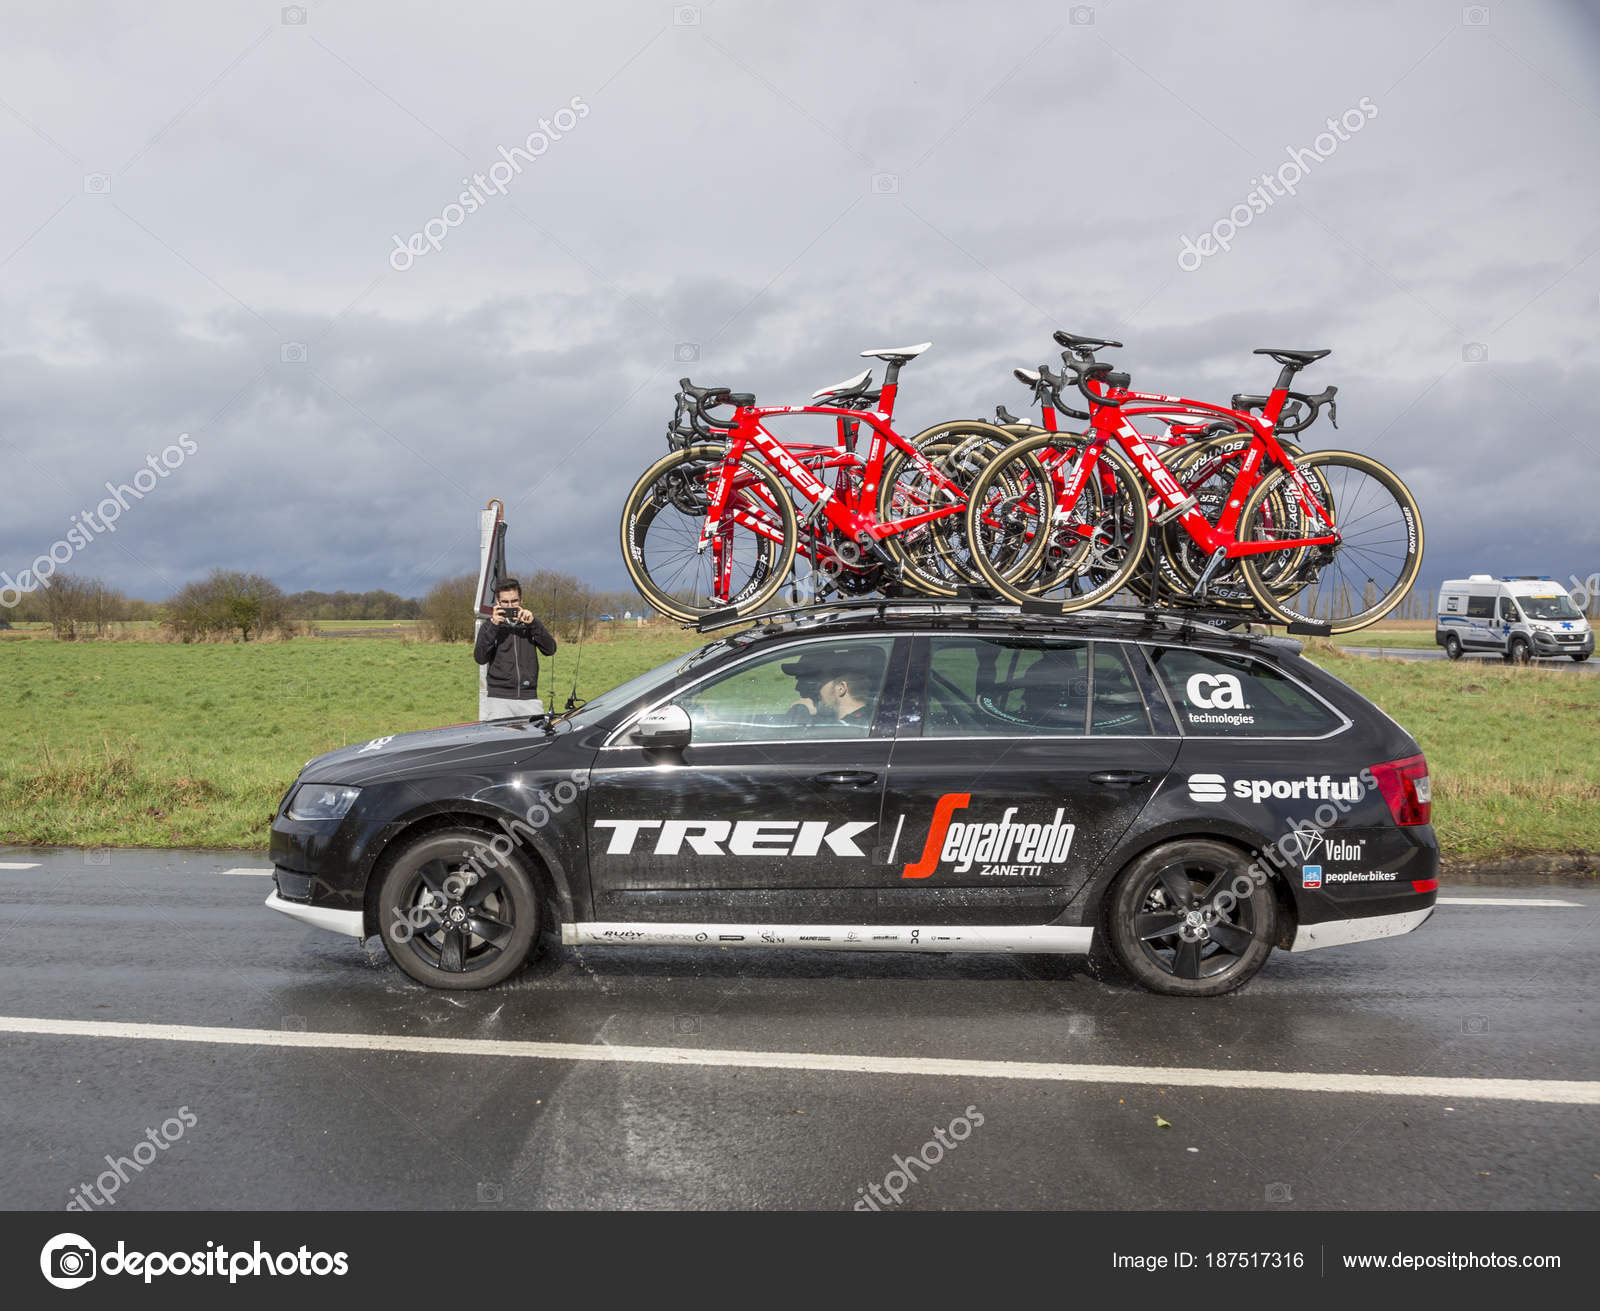 Das Auto des Team Trek Segafredo - Paris-Nizza 2017 — Redaktionelles ...